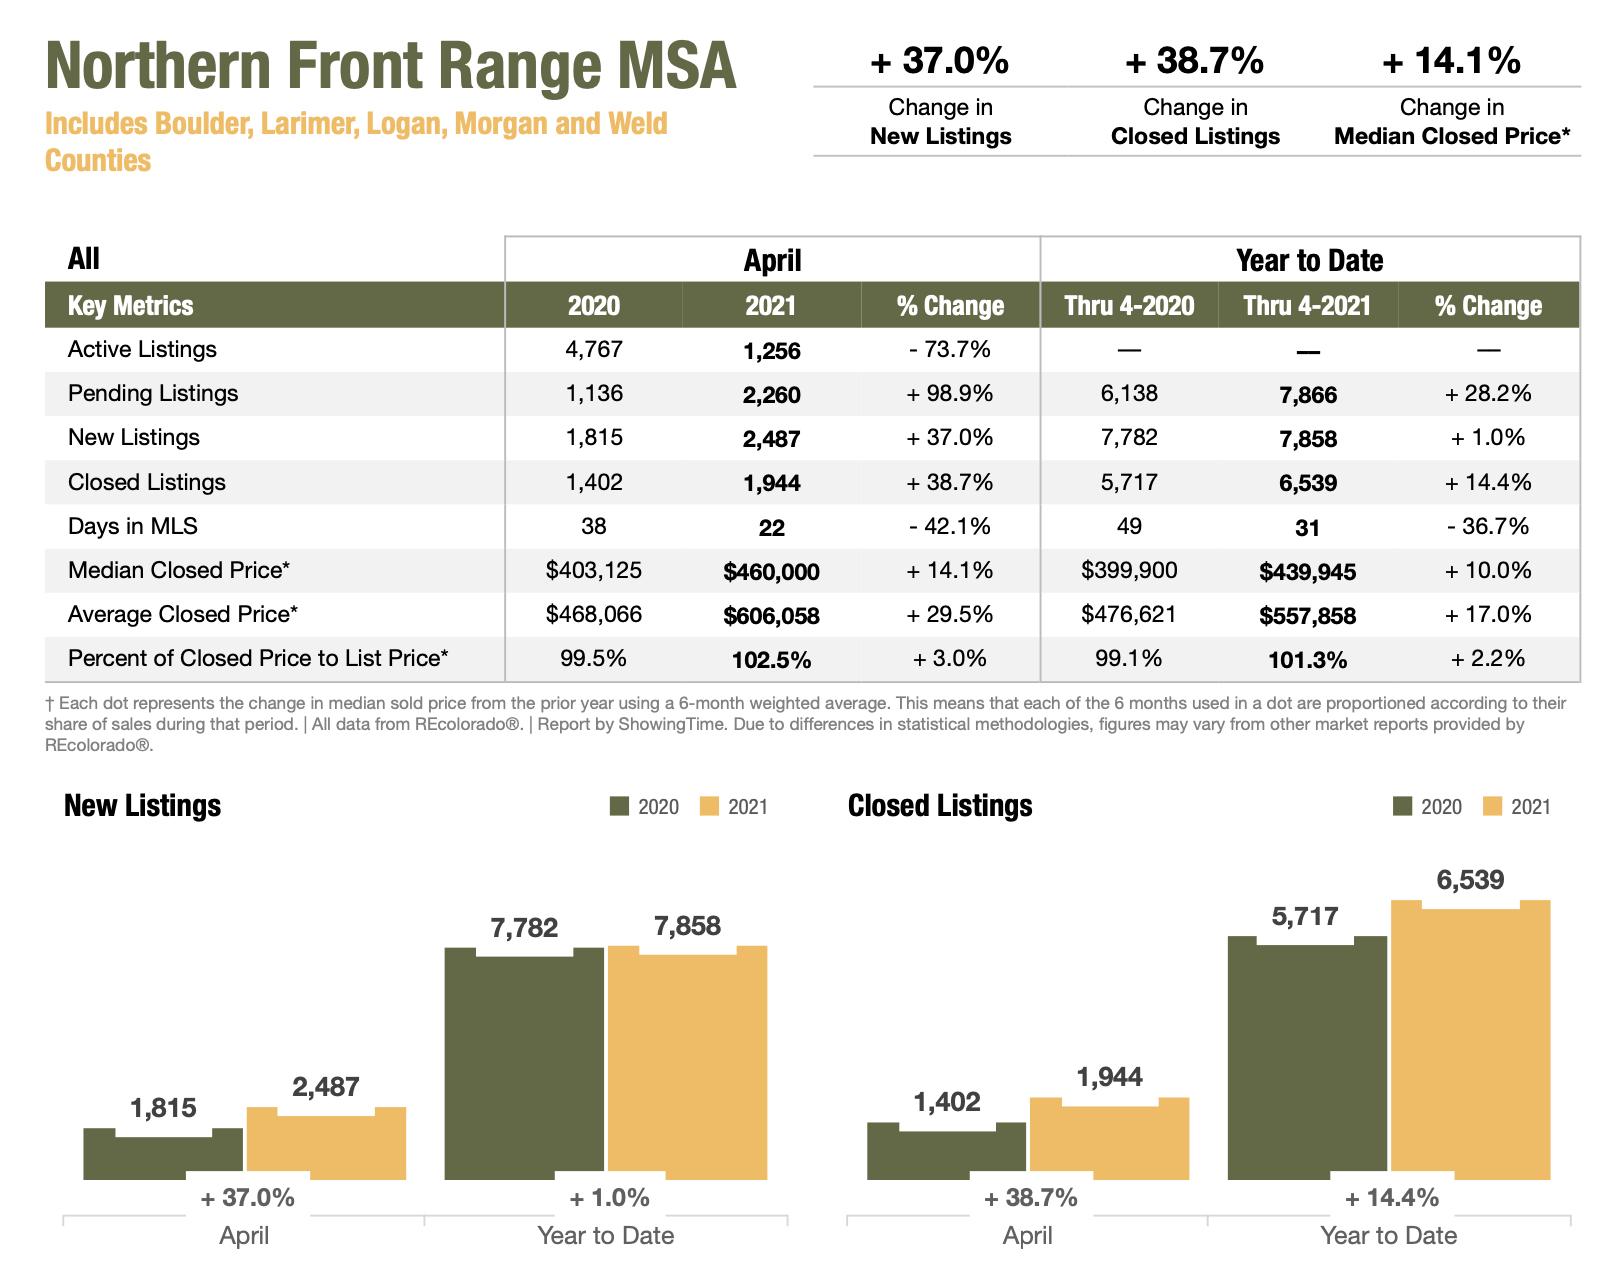 Colorado Real Estate Market Report Northern Front Range MSA April 2021